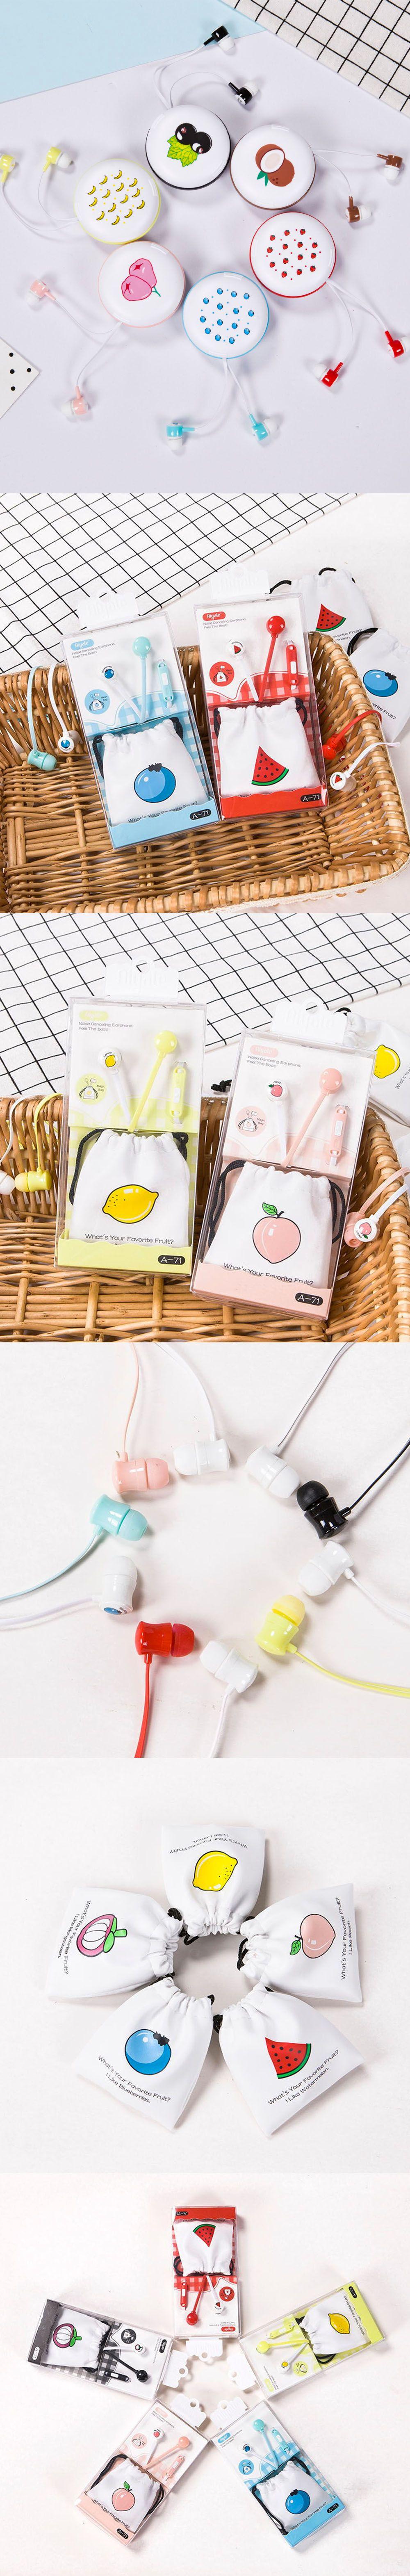 Fruits Earbud Cute Design